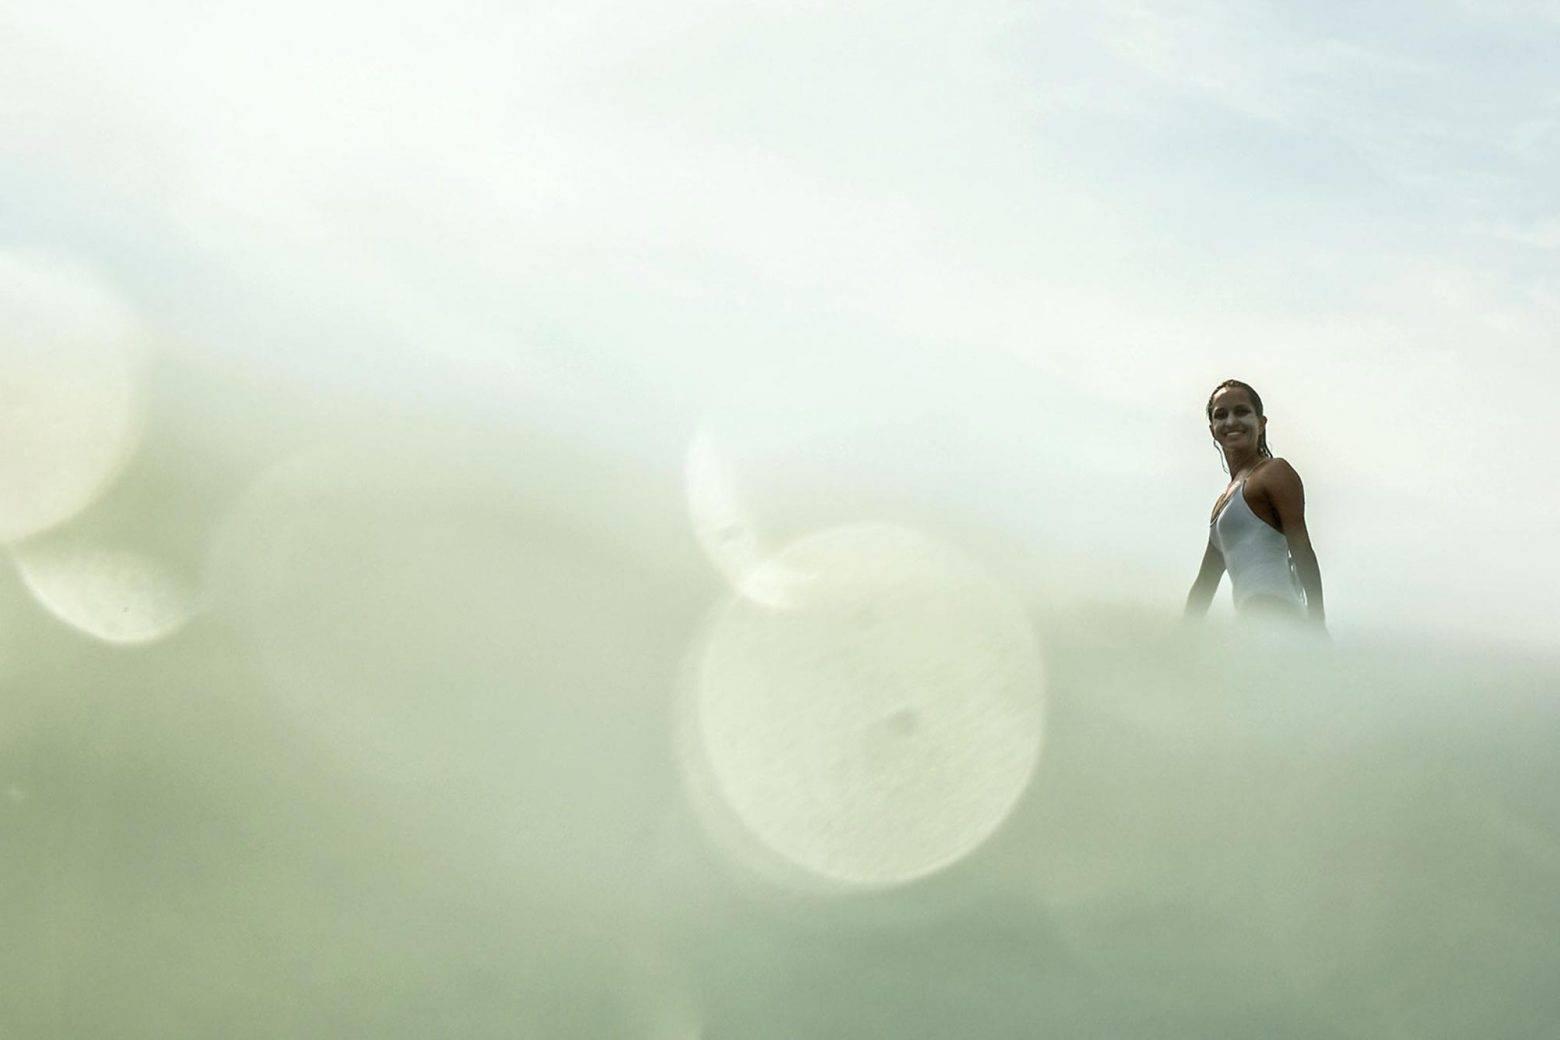 https://www.soulandsurf.com/wp-content/uploads/2021/07/lanka-surf-1-e1627738697415.jpeg Image